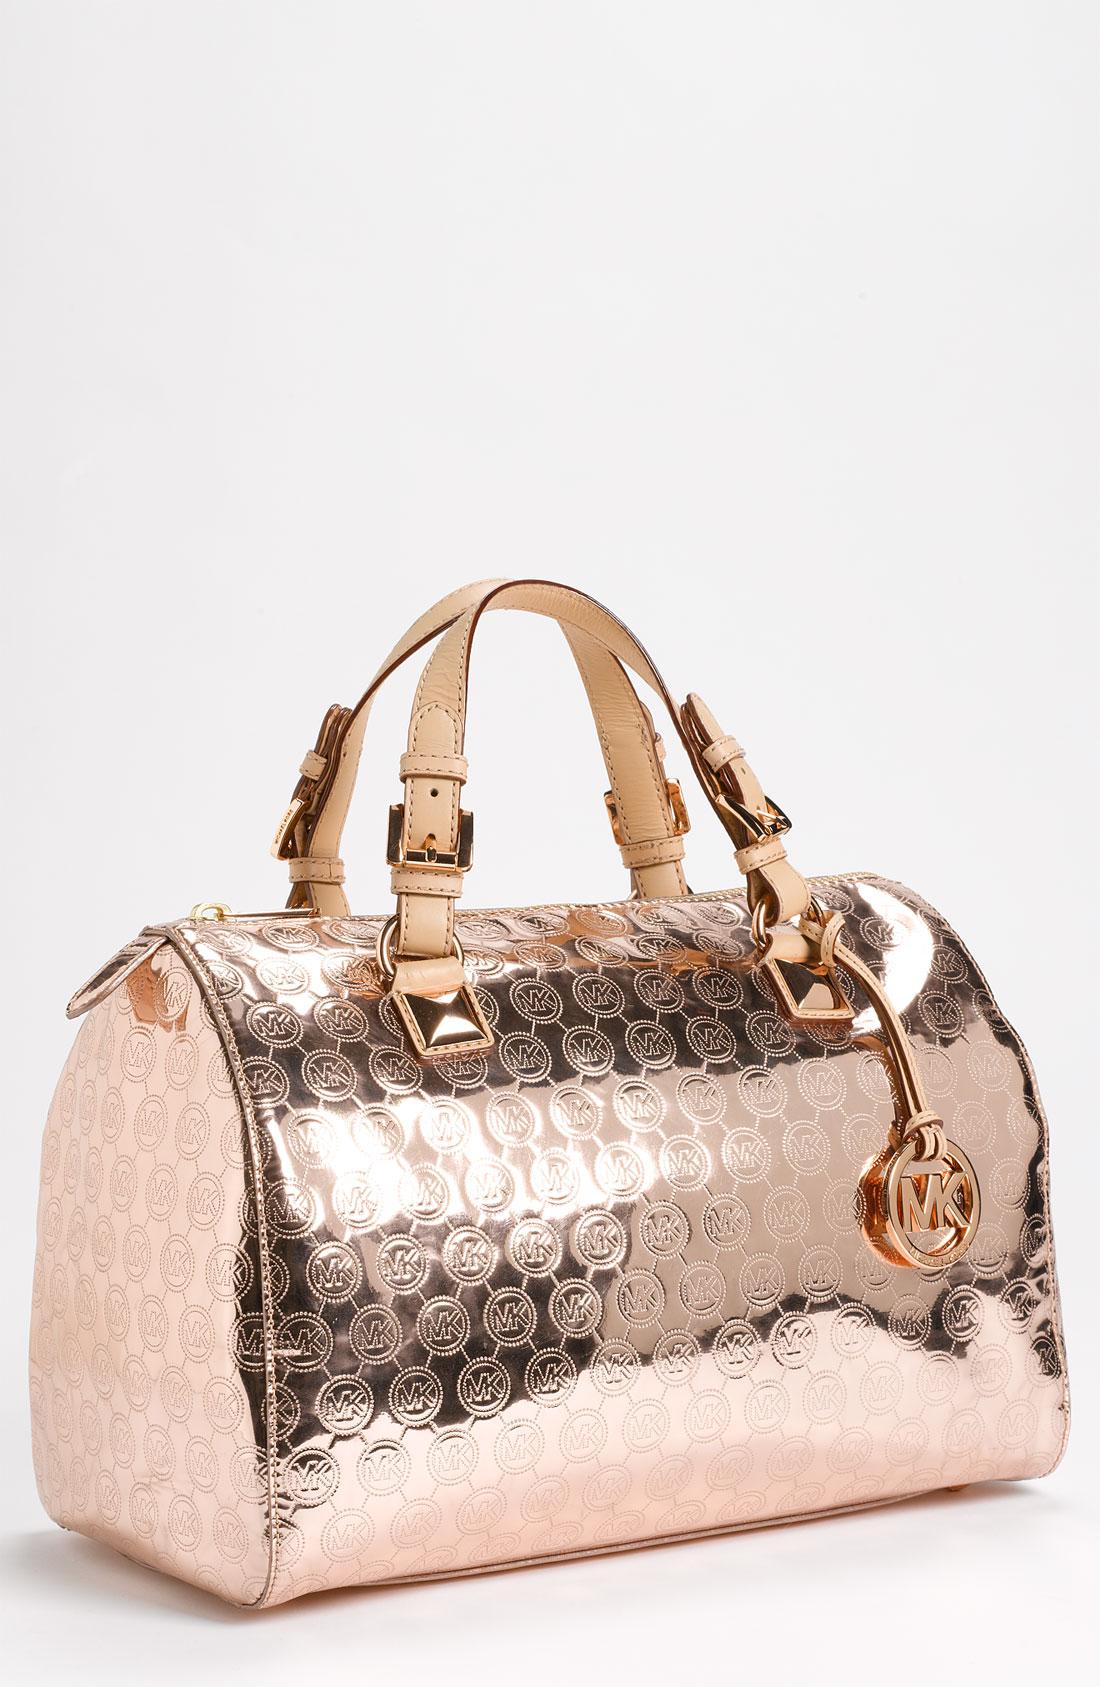 michael michael kors grayson large satchel in gold rose gold lyst. Black Bedroom Furniture Sets. Home Design Ideas